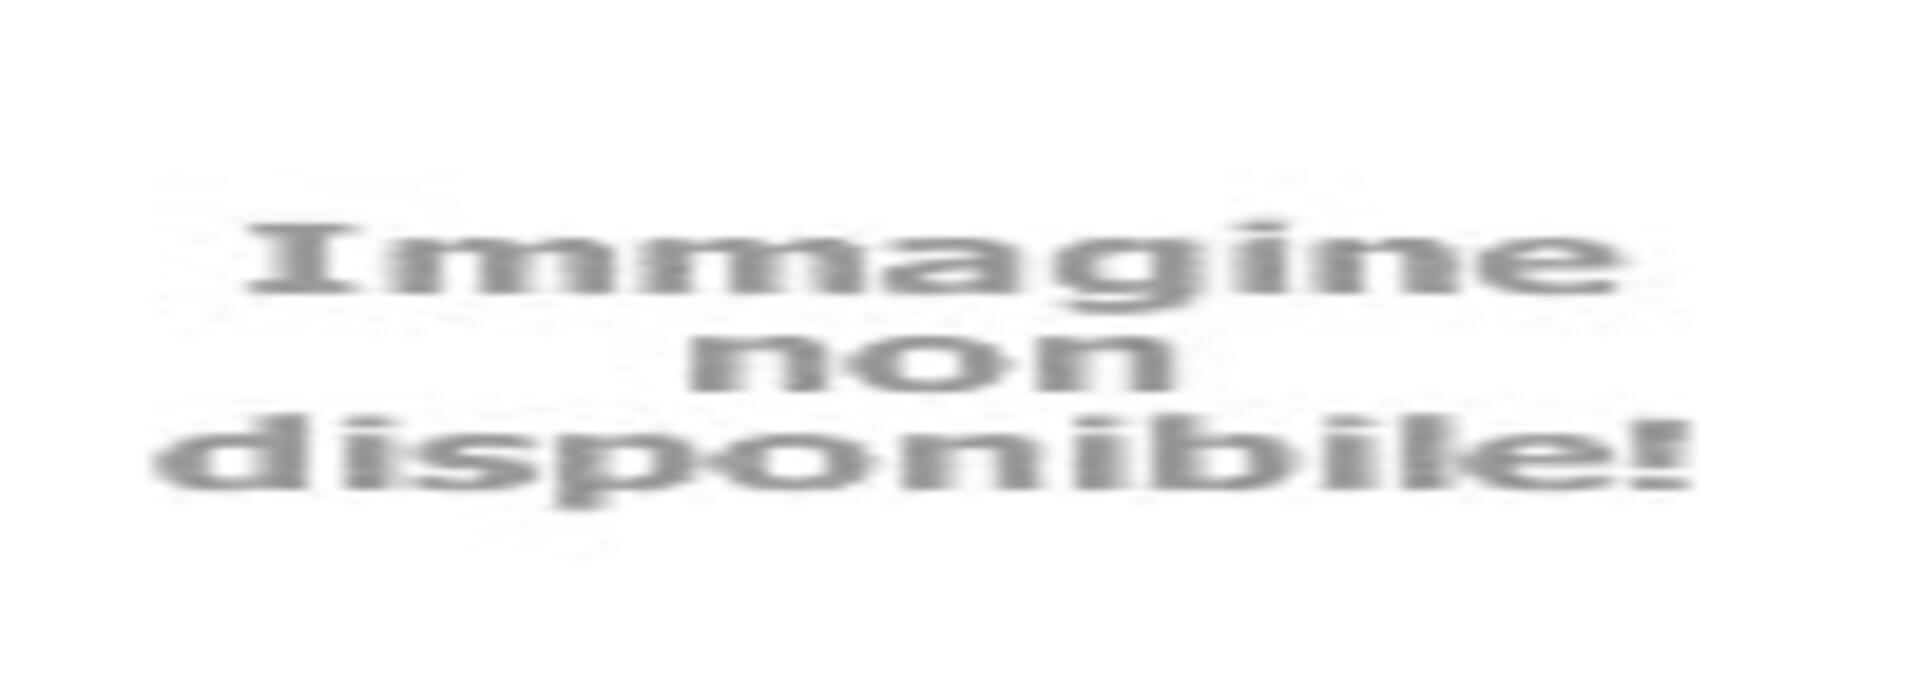 hotel-montecarlo pl pietro-poddasza 019